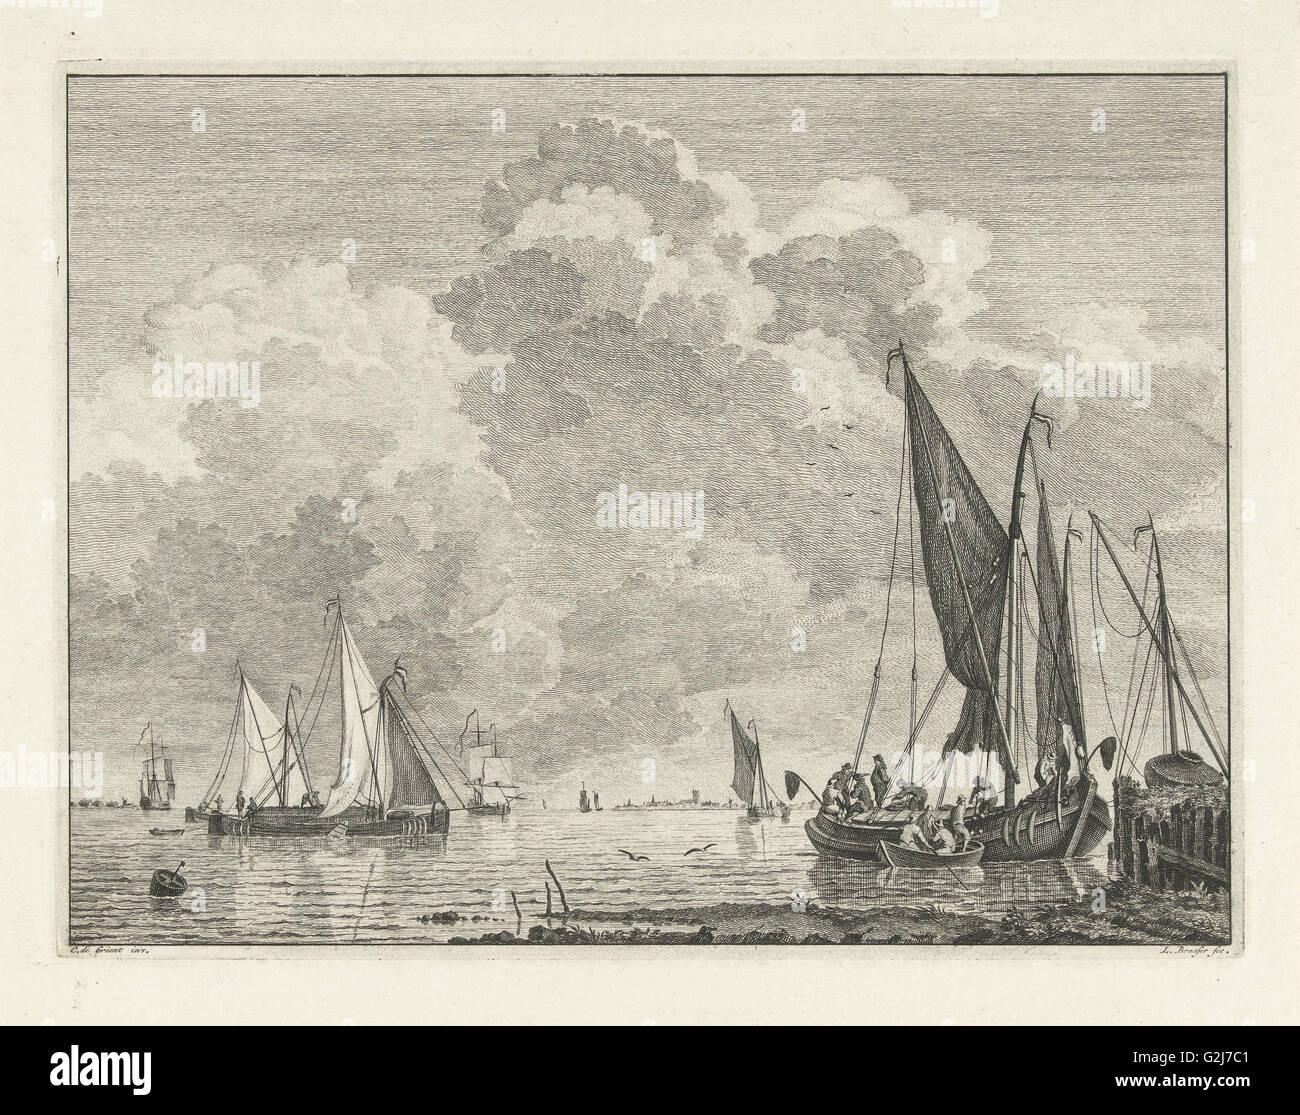 River view with ships, Leendert Brasser, 1727 - 1793 - Stock Image